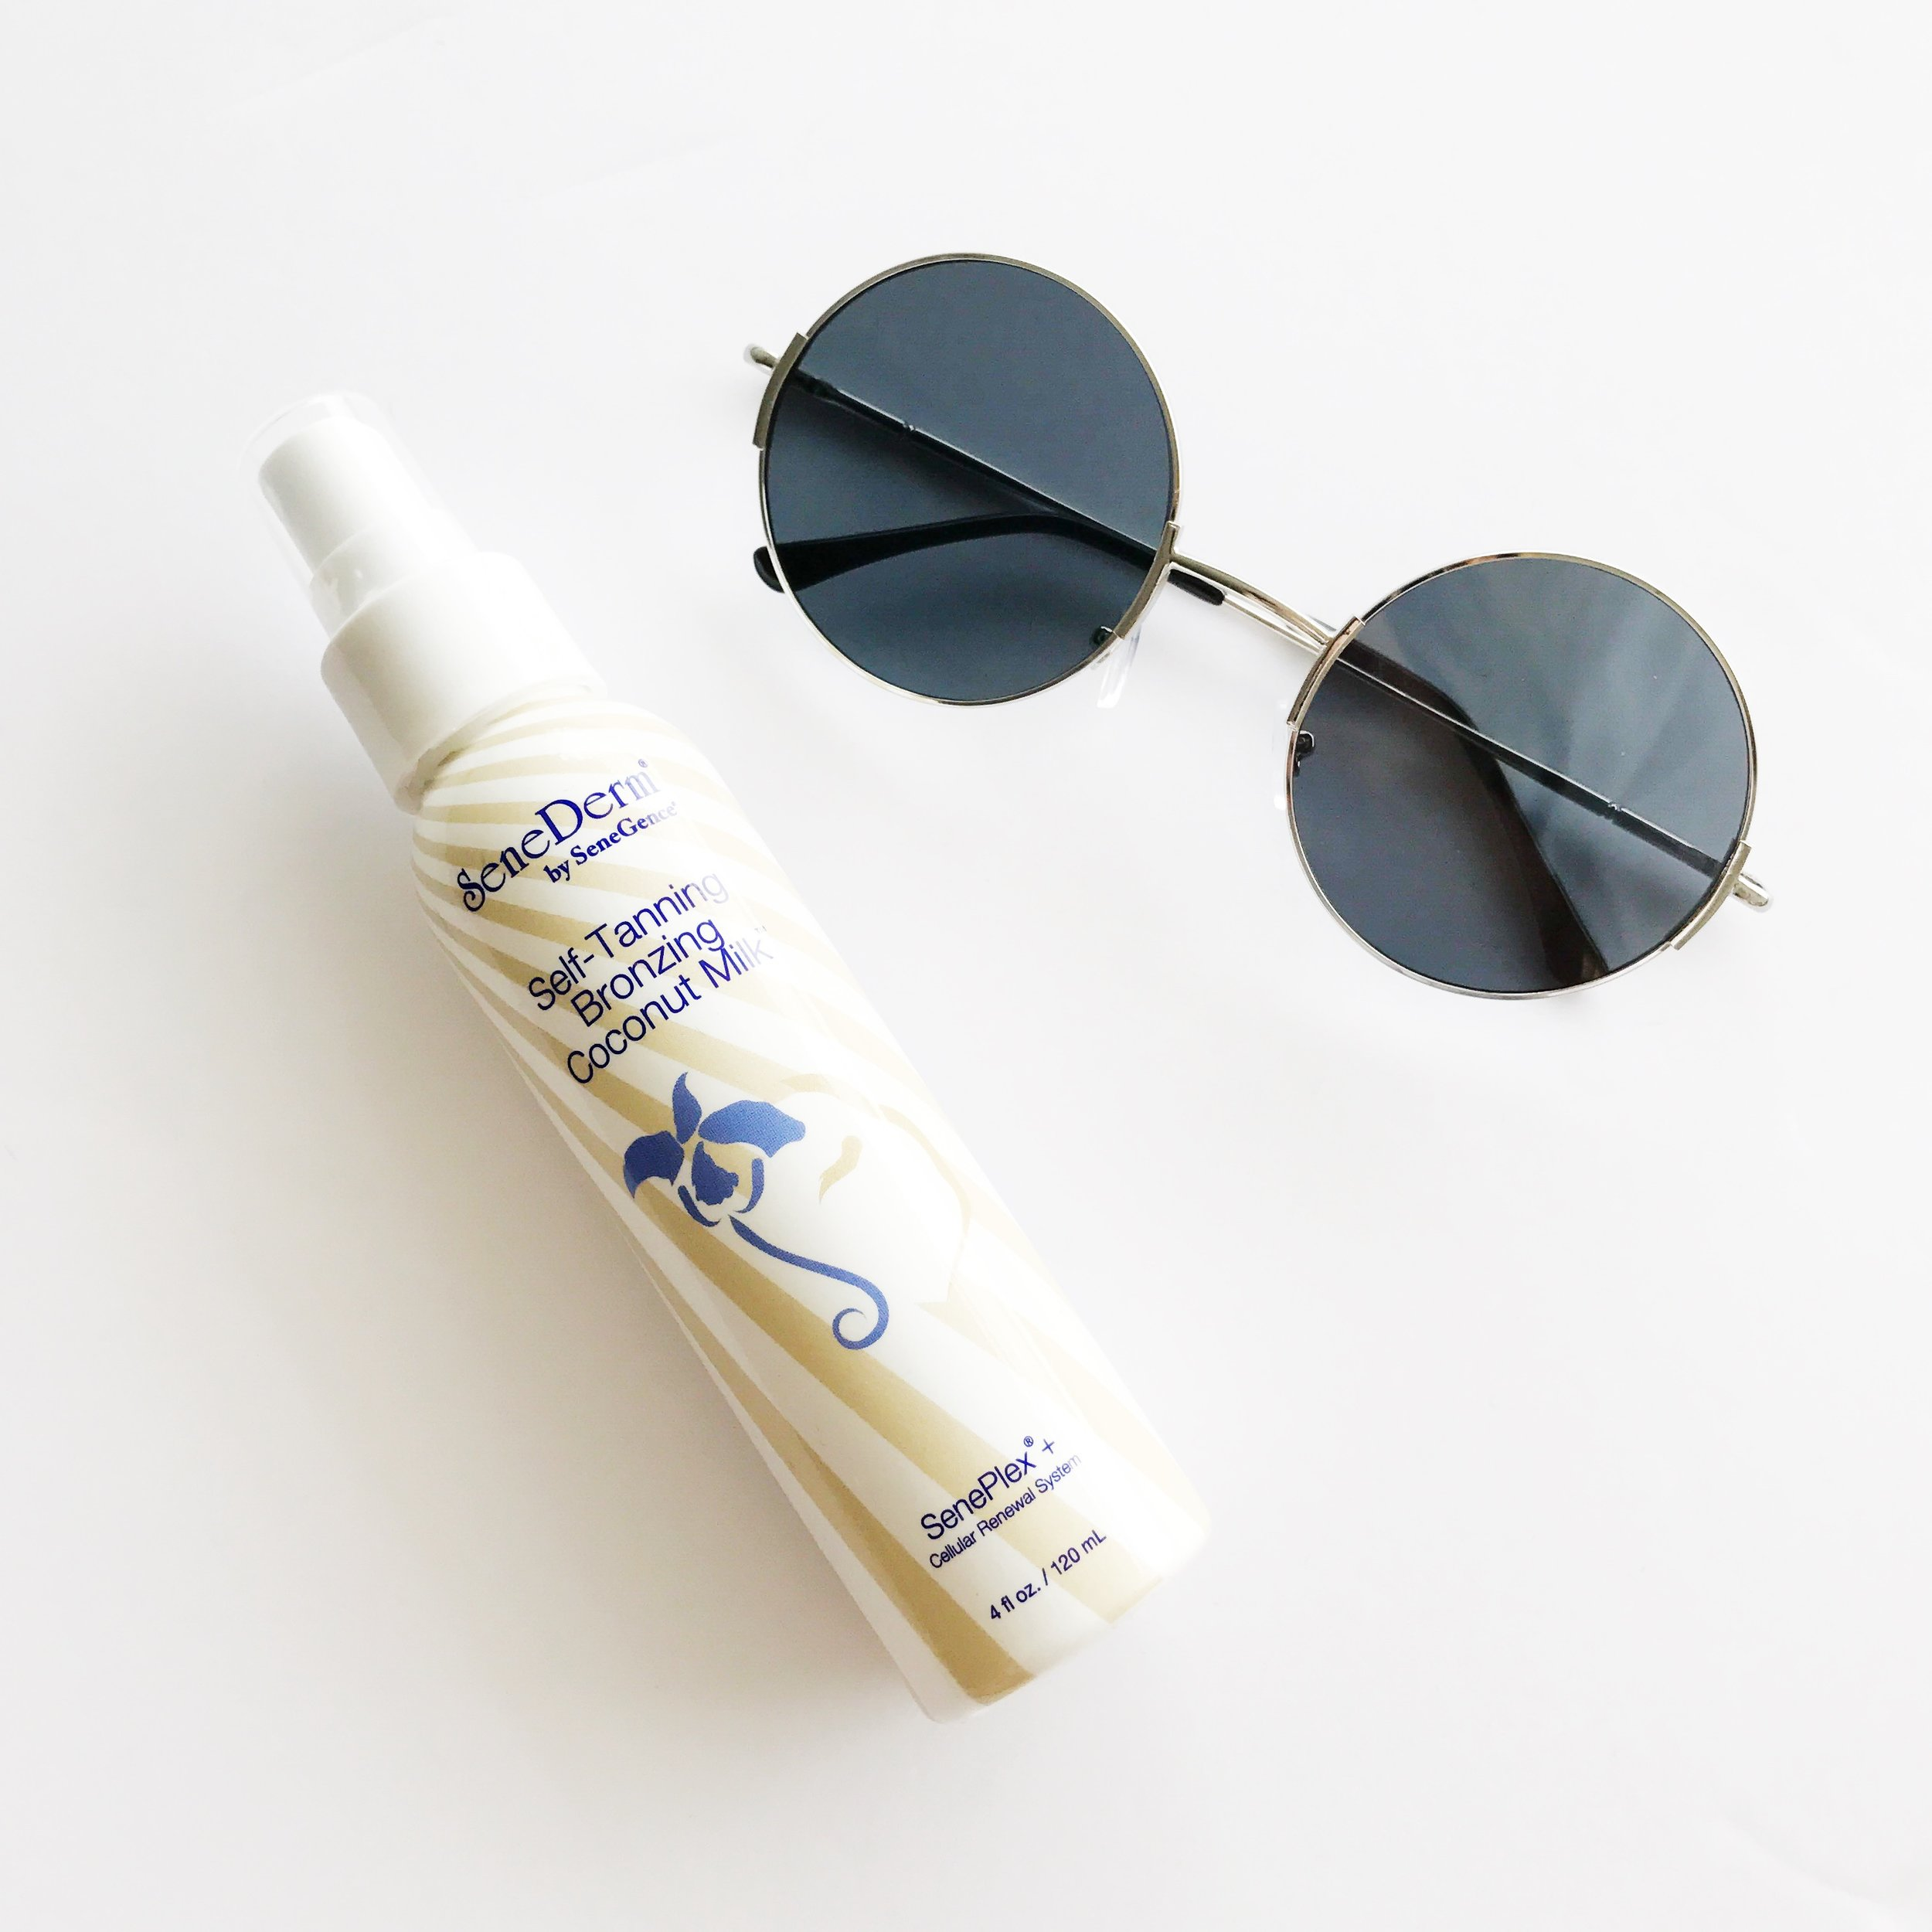 - Order your Self Tanning Bronzing Coconut Milk